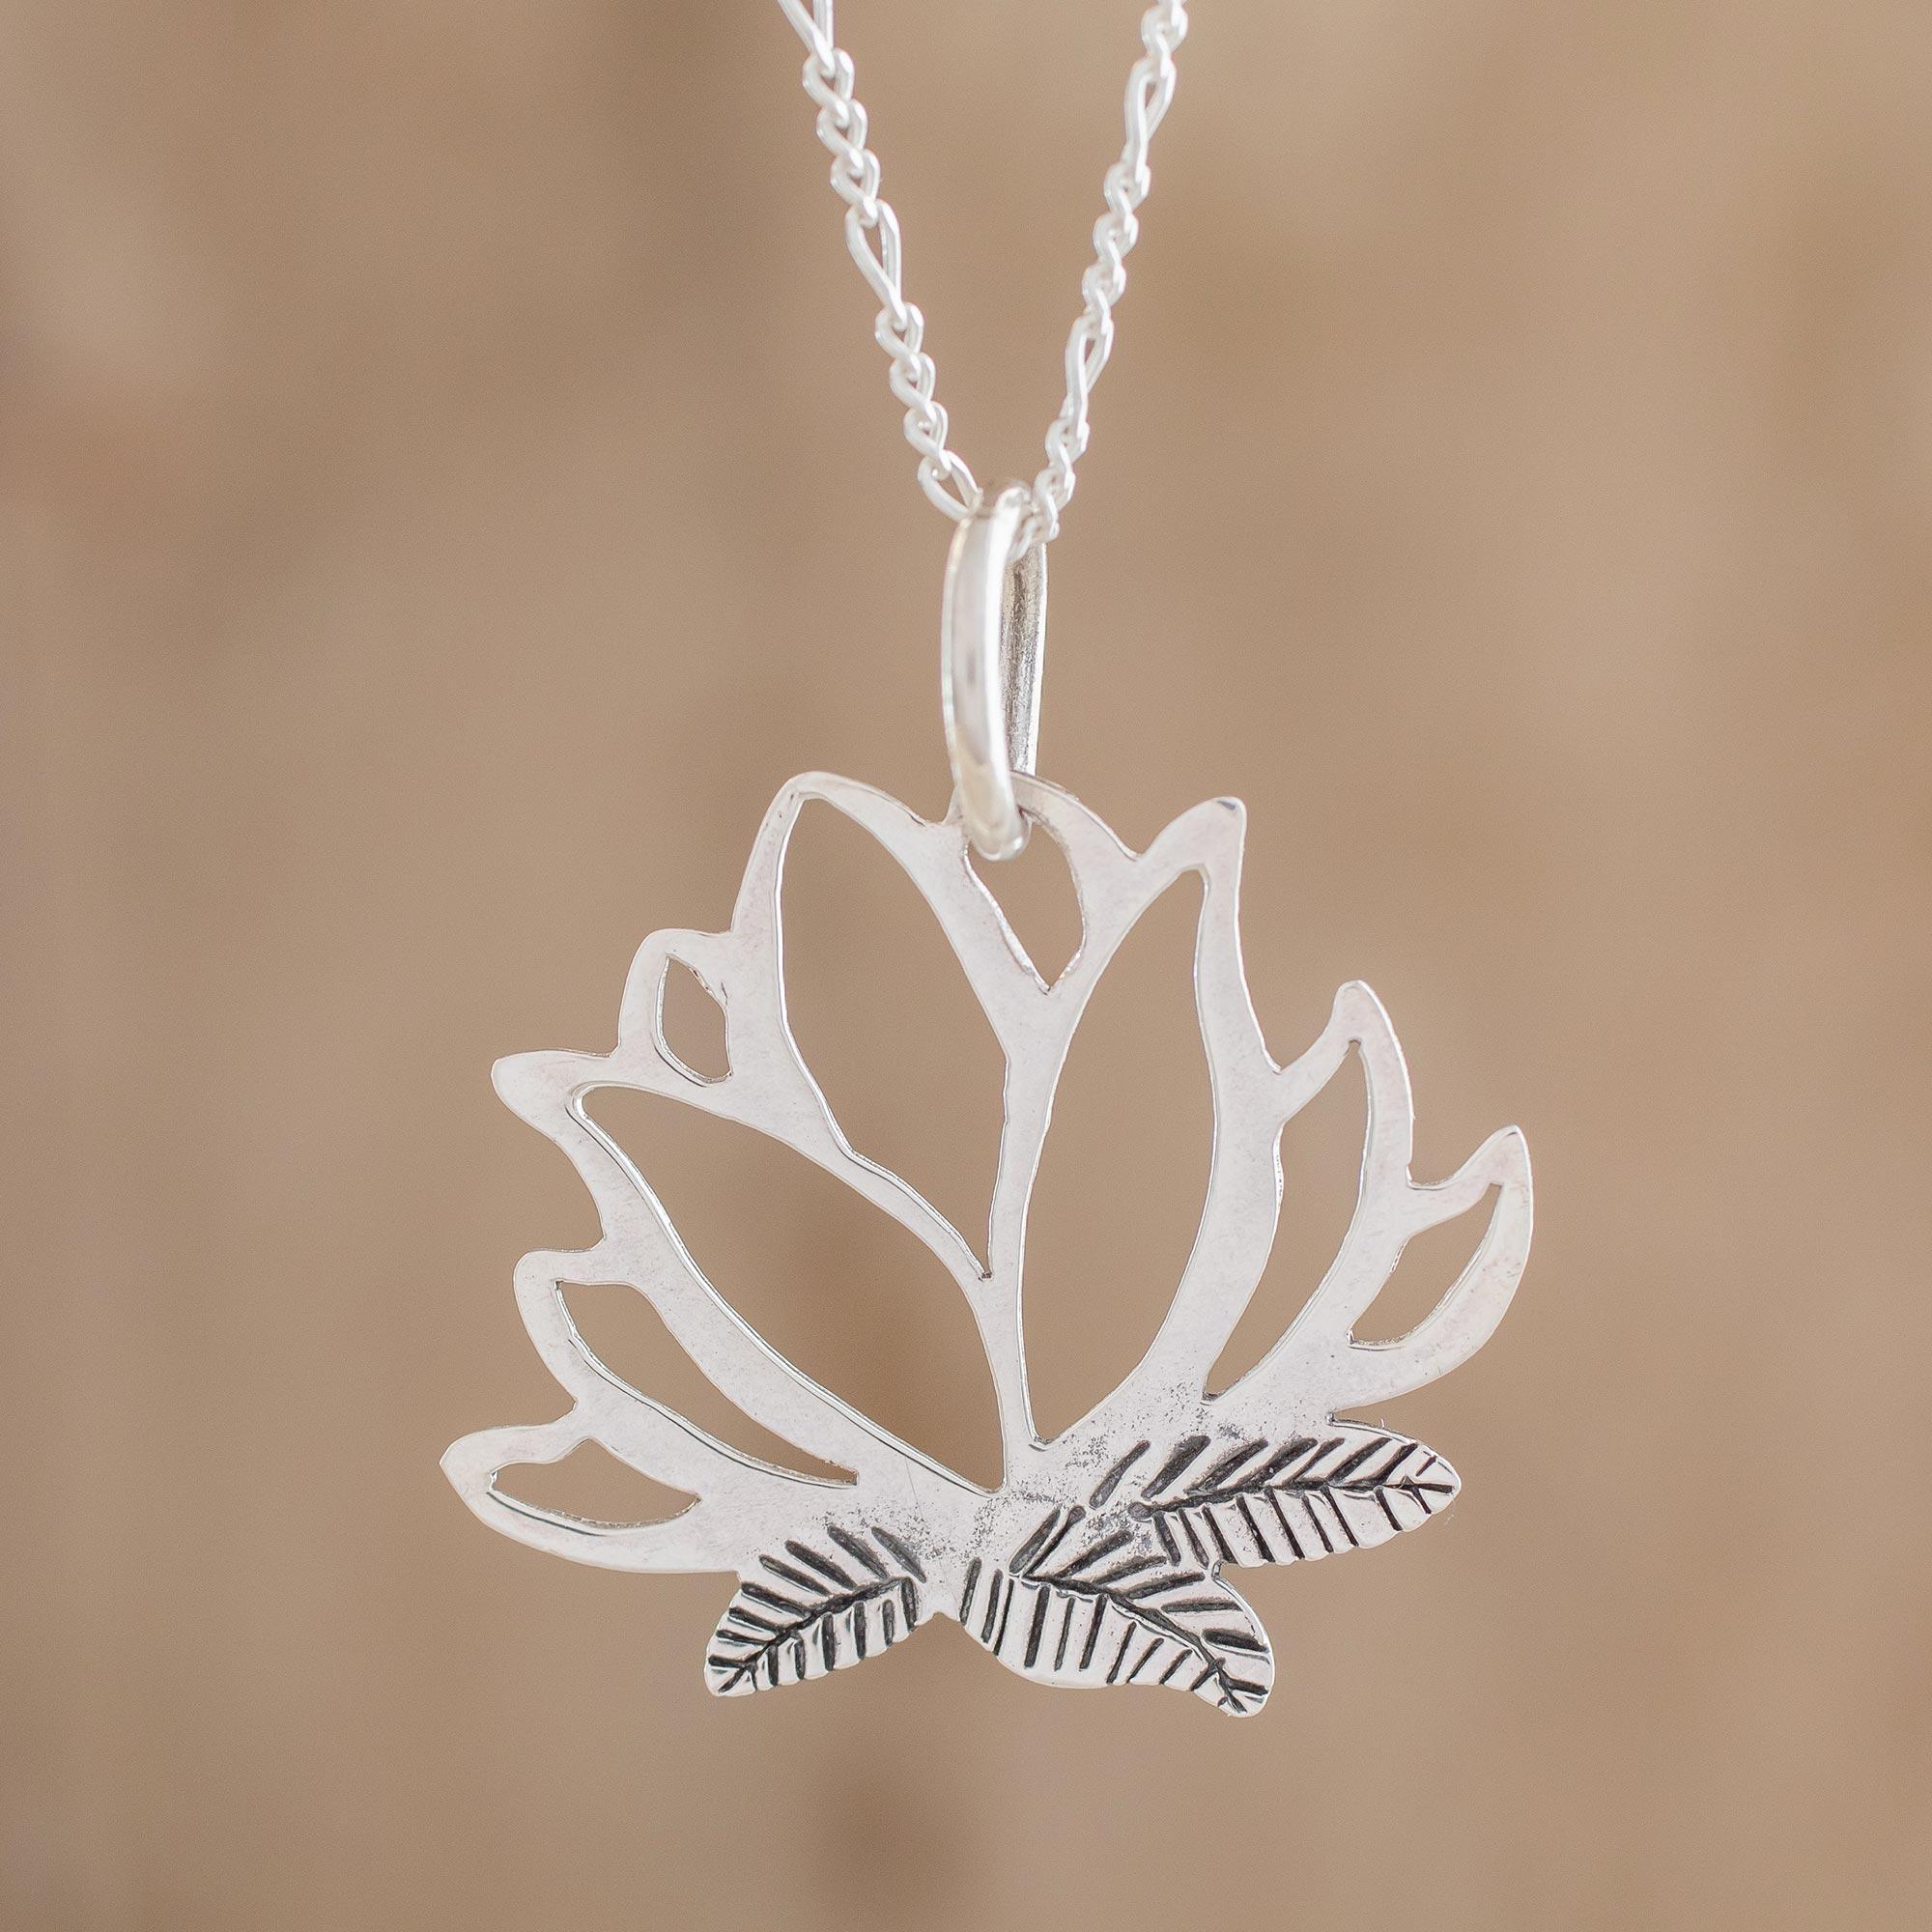 Beautiful Artist Lotus Flower Glass Pendant Handmade Art Necklace Silver Gift Present